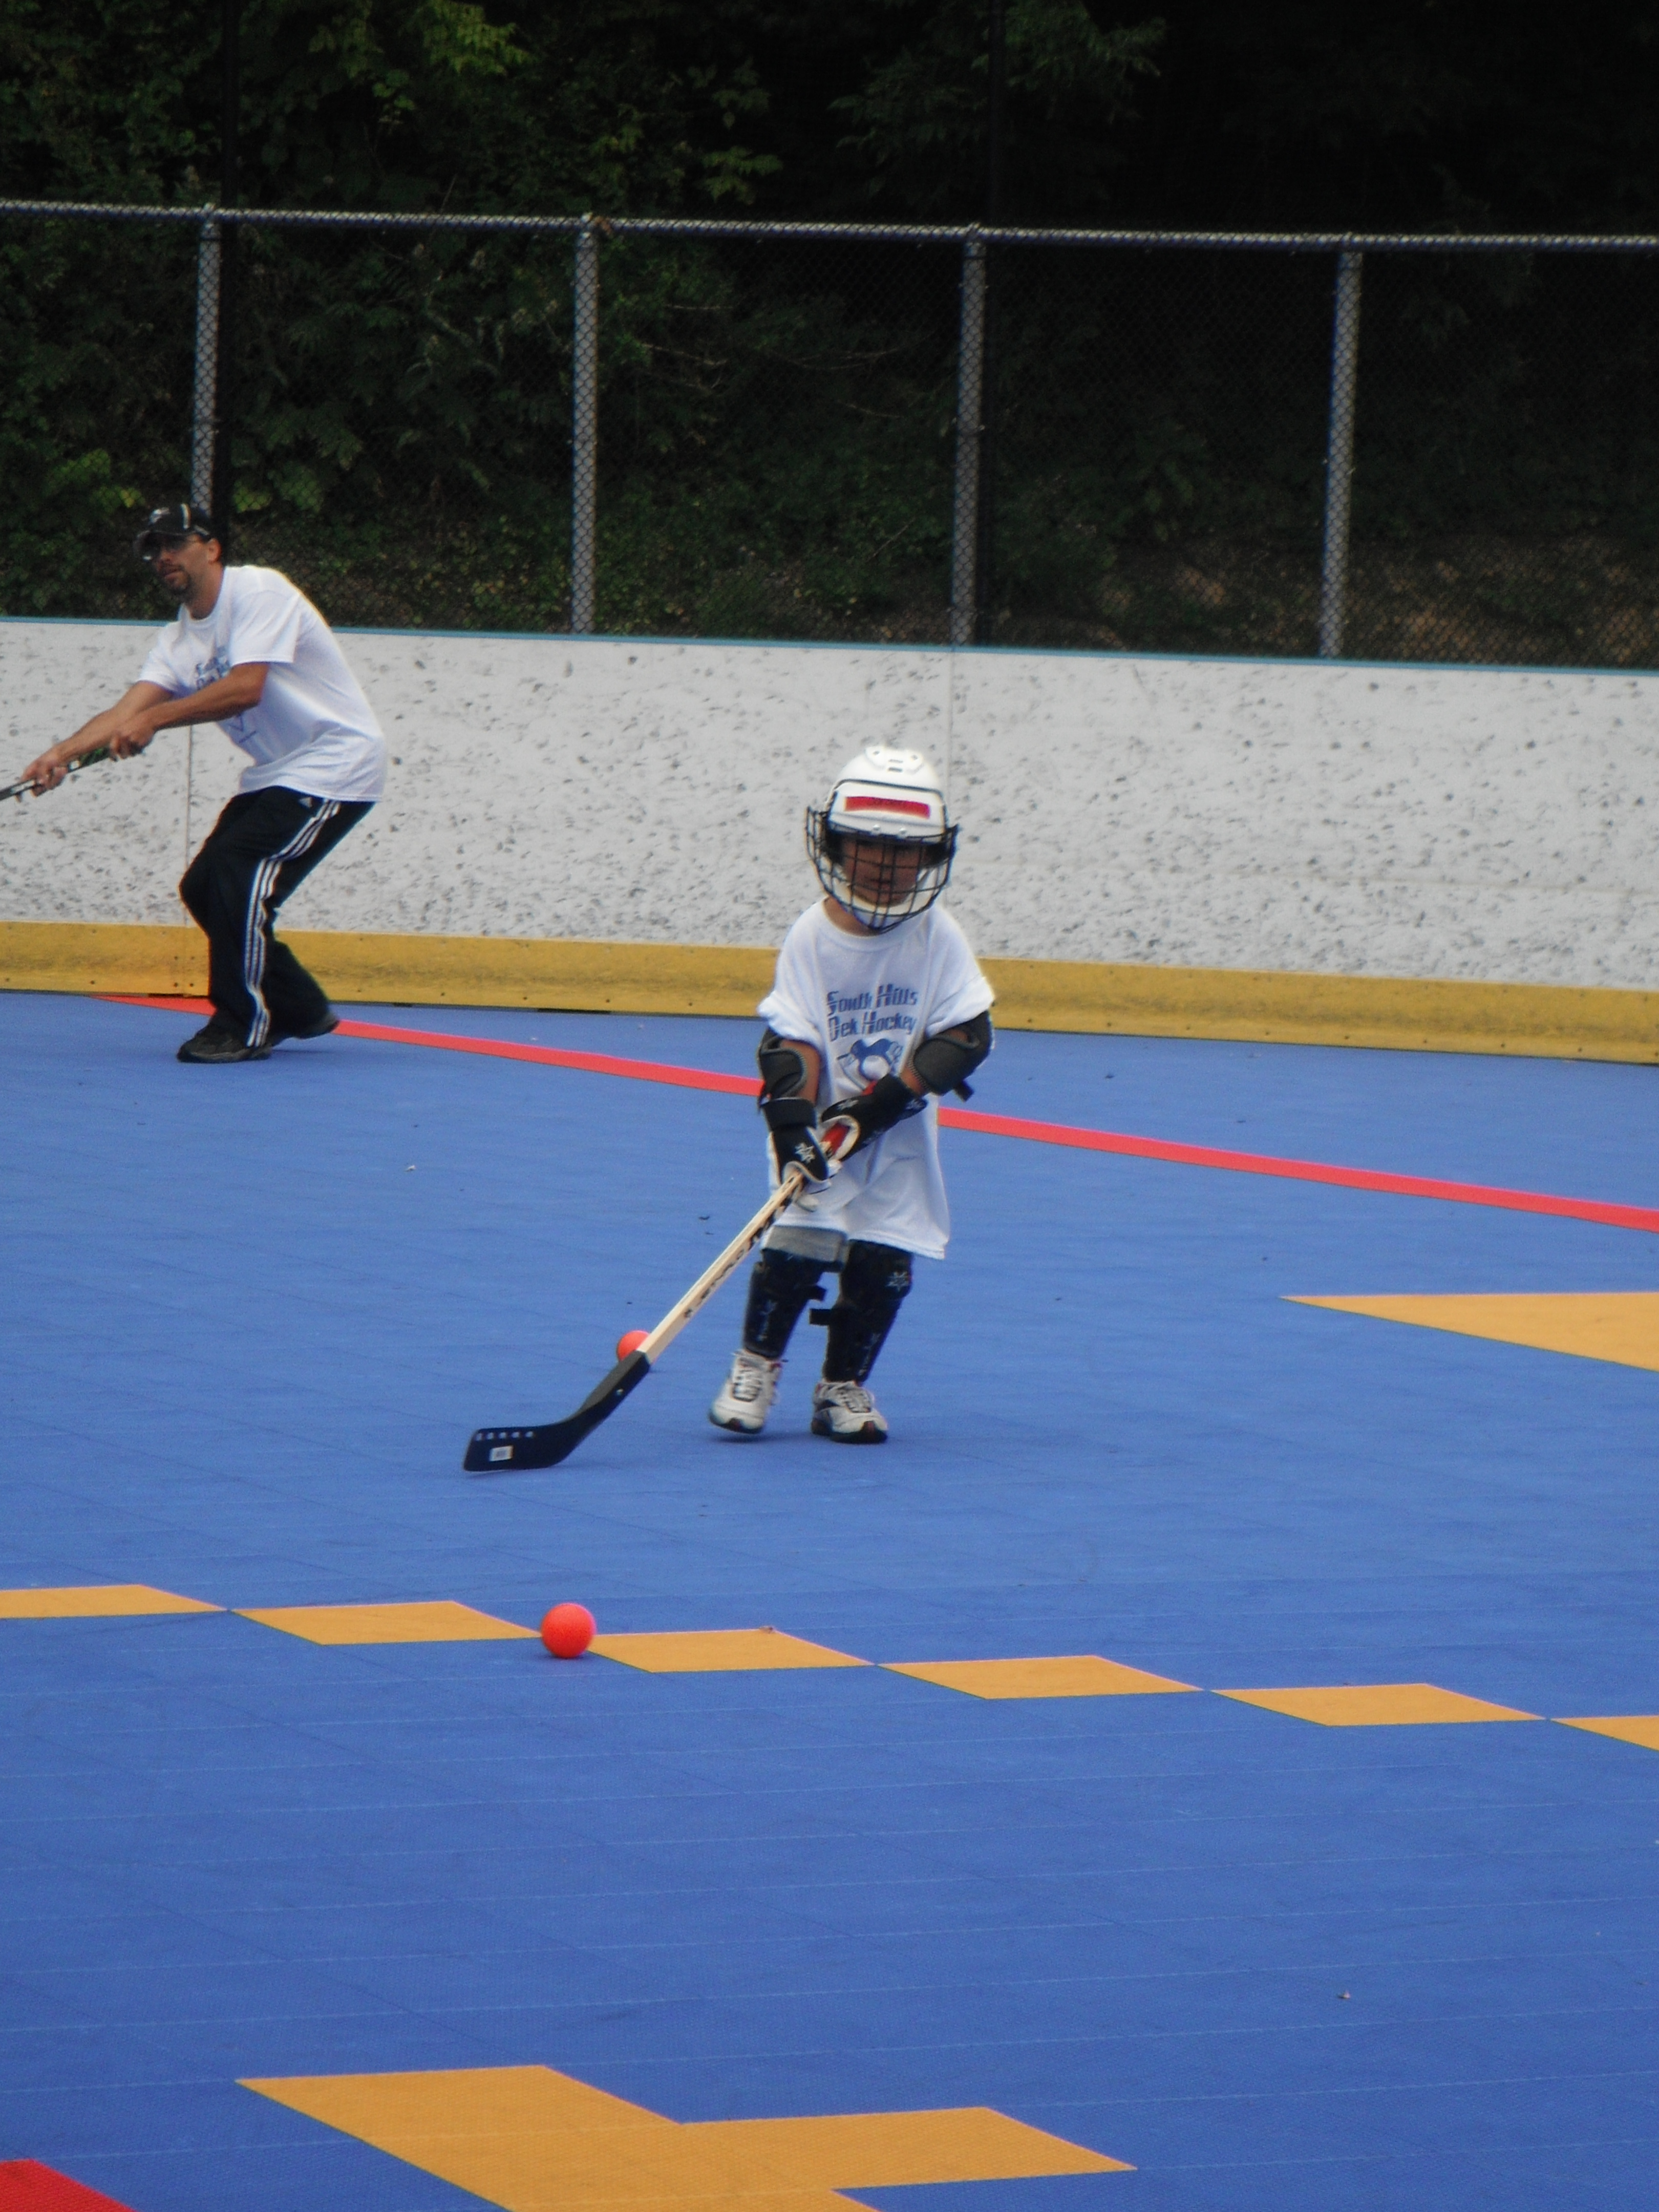 North Hills Dek Hockey – North Hills Dek Hockey